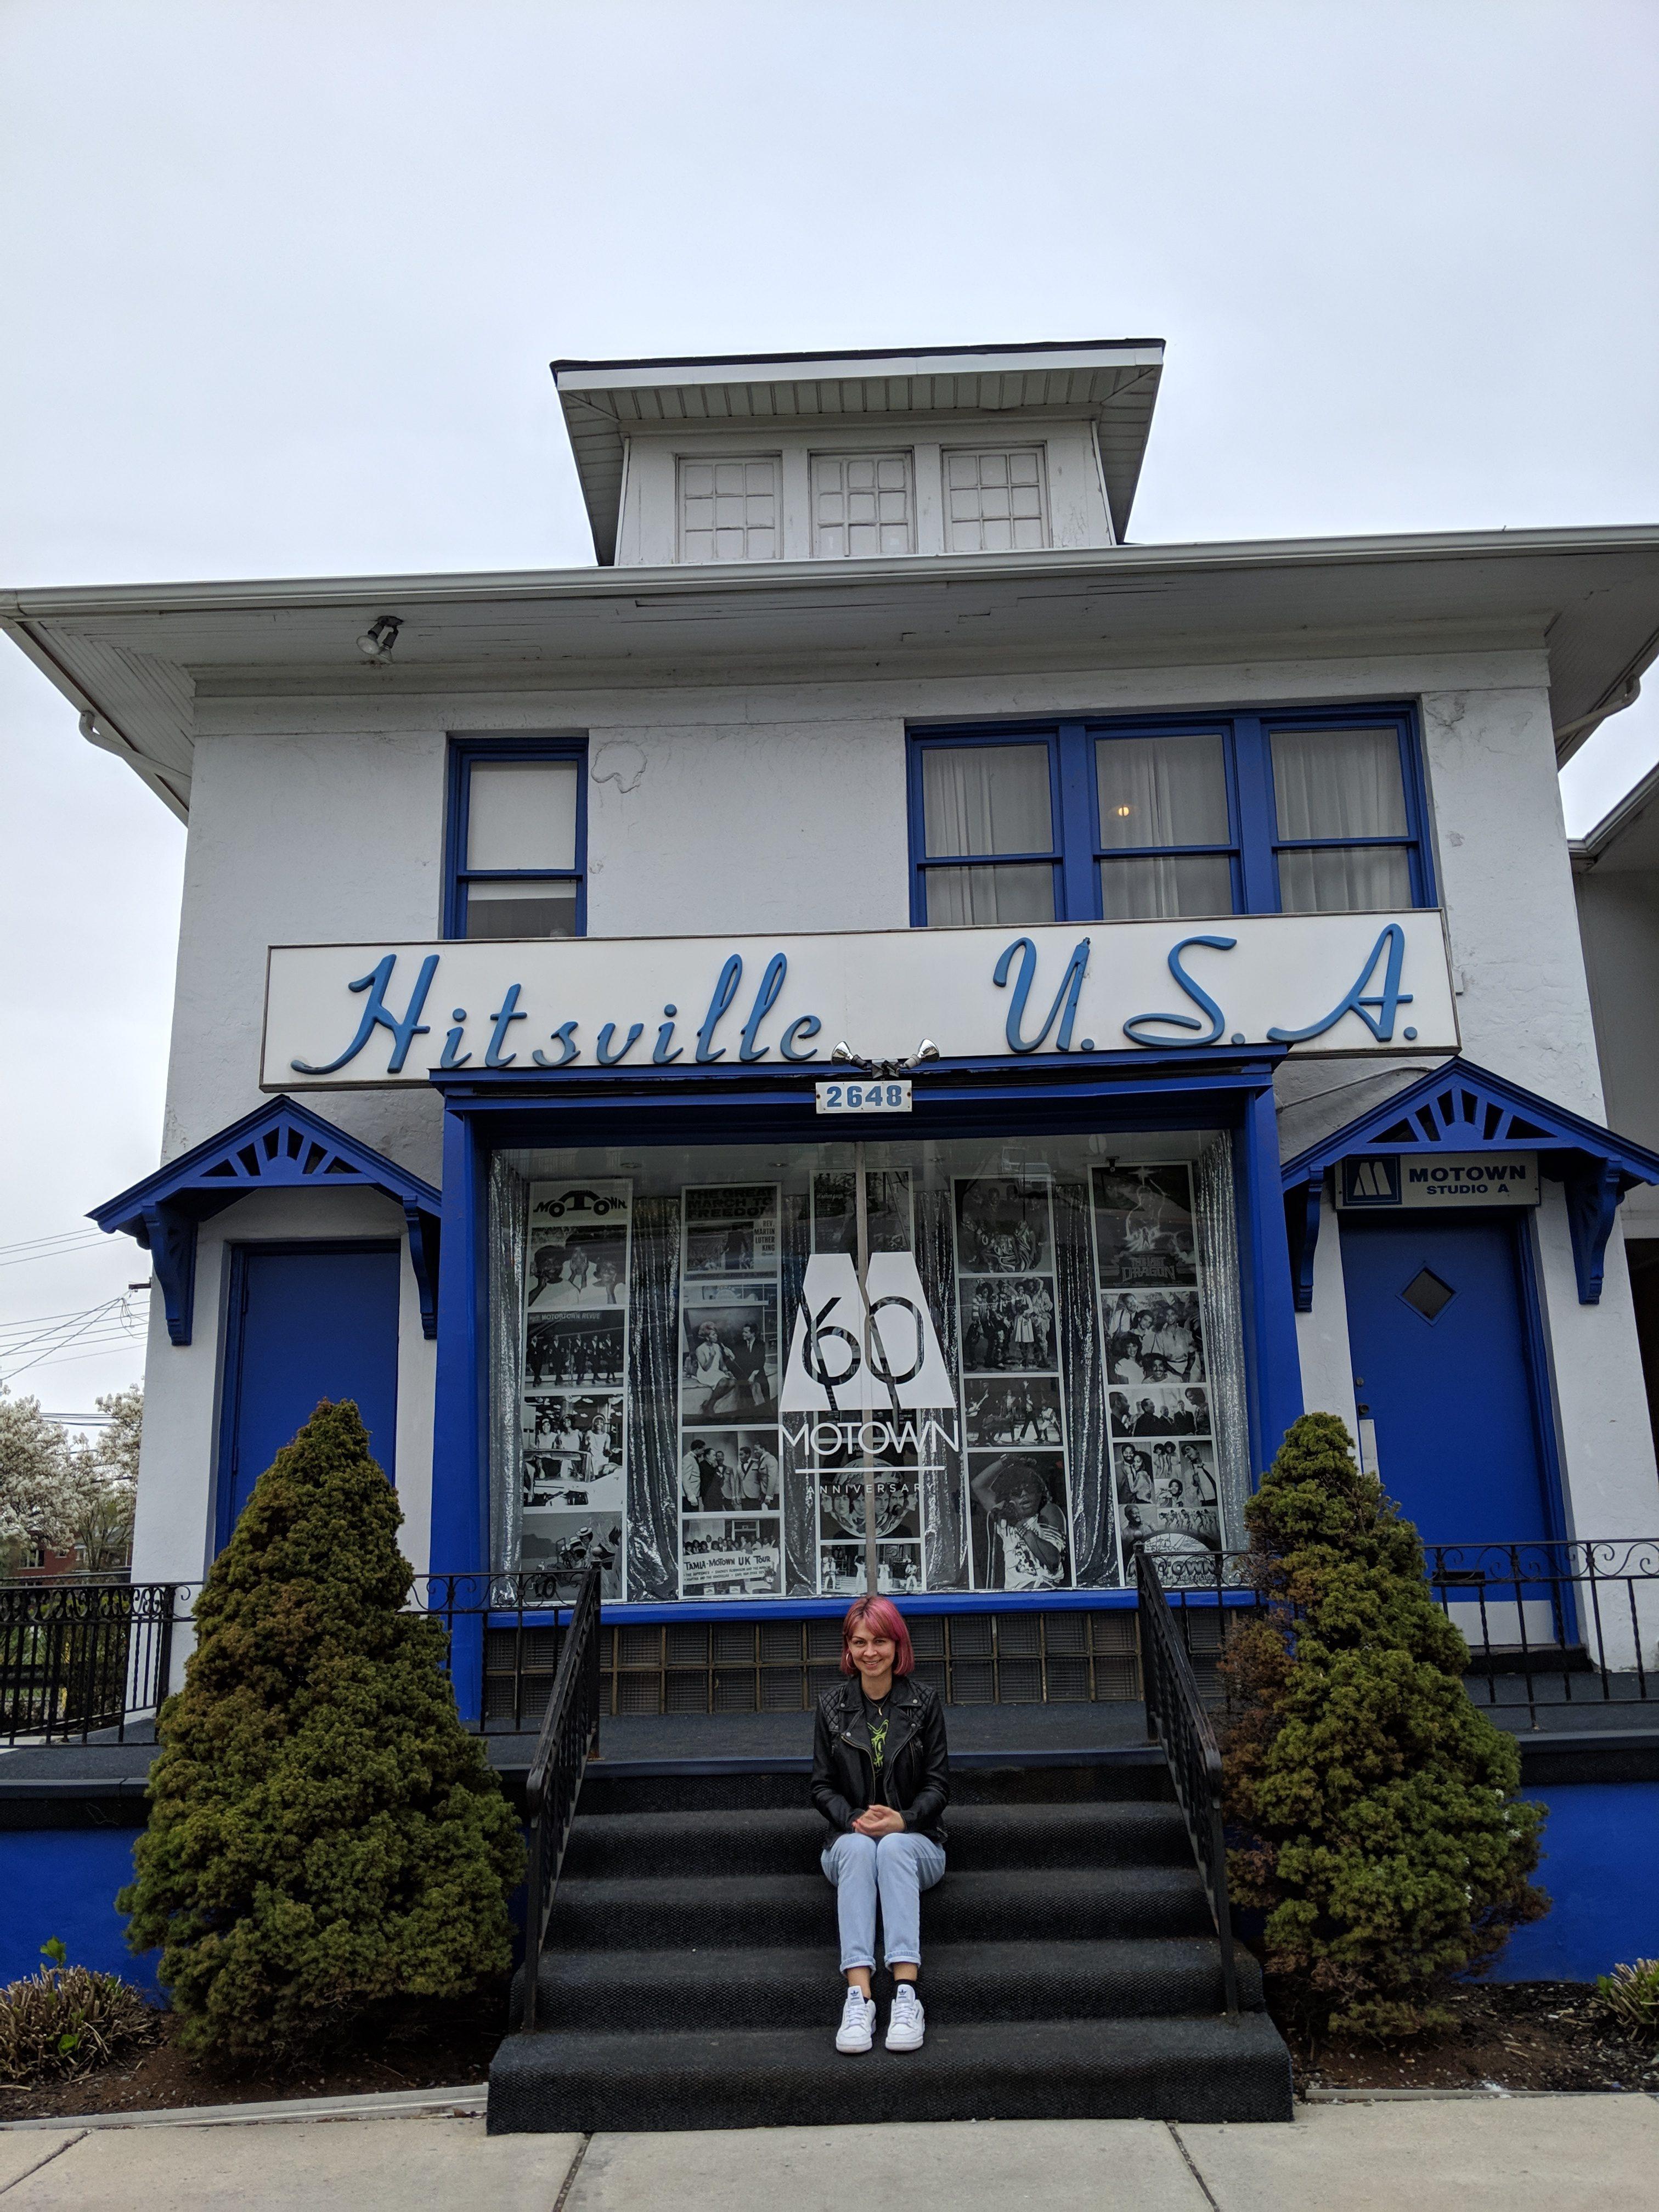 Hitsville USA Motown Museum